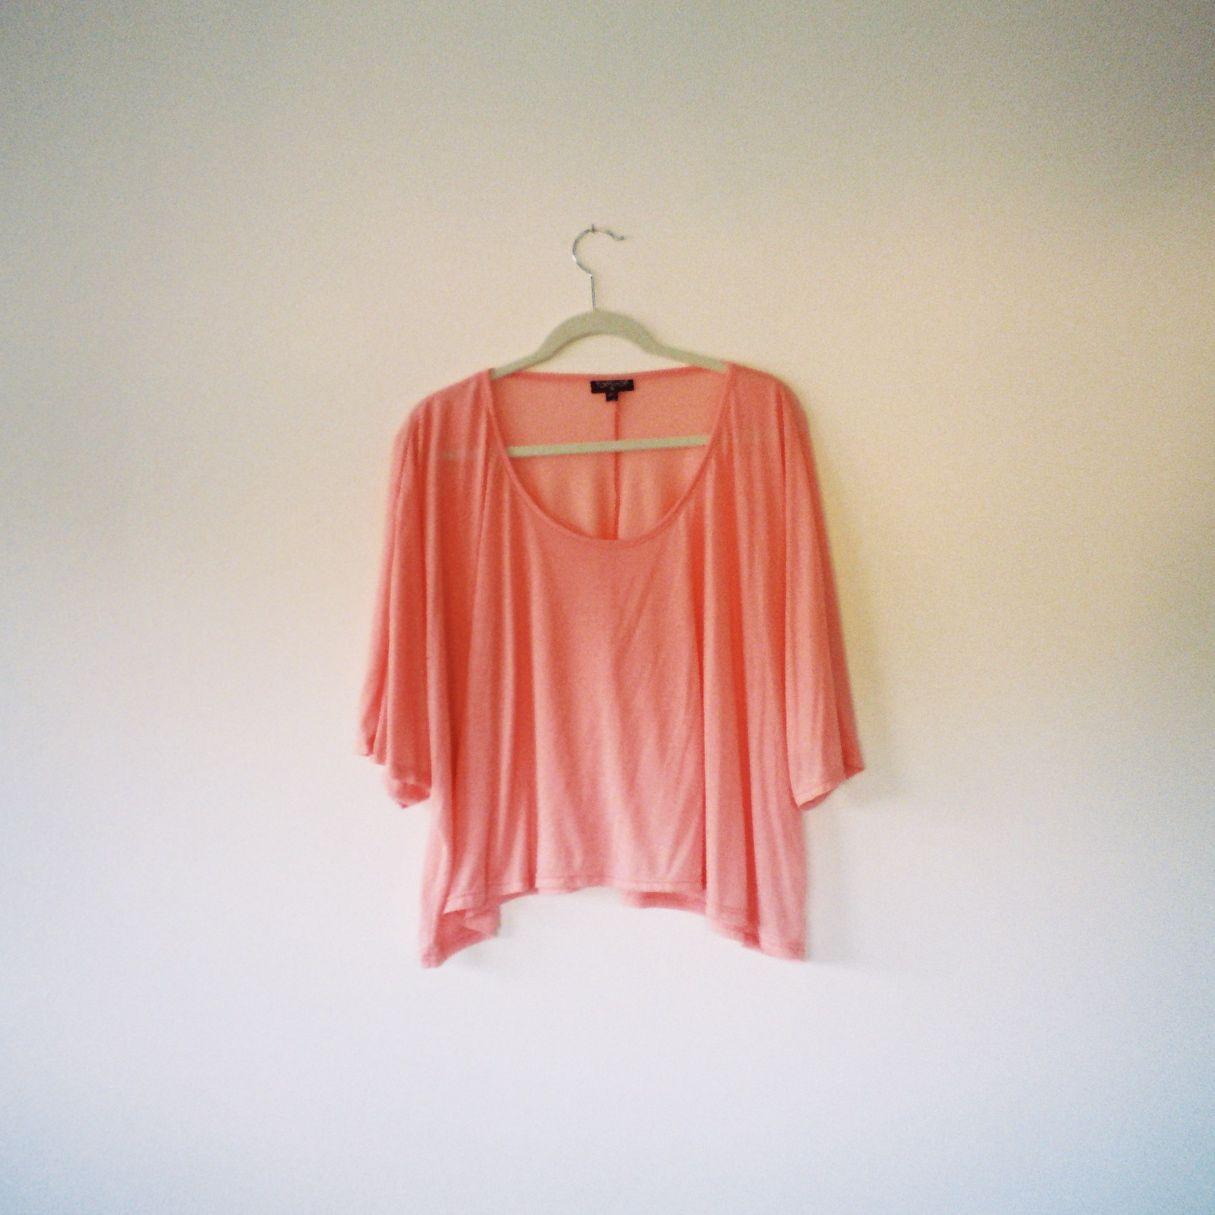 flowy shirts | clothes n stuff | Pinterest | Clothes, Fashion 101 ...